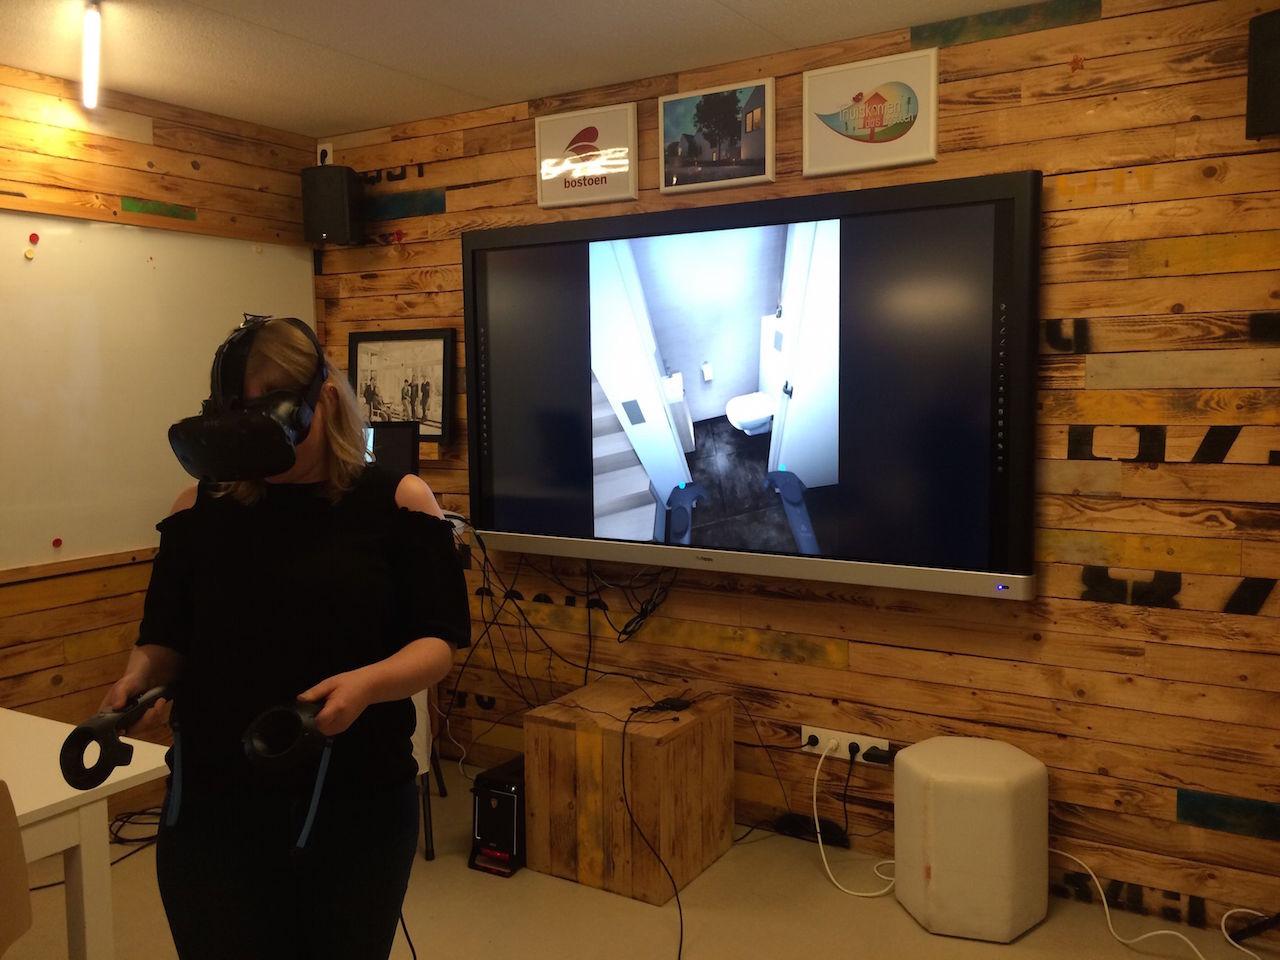 Bostoen Virtual Reality Demo - Invisible Puppy